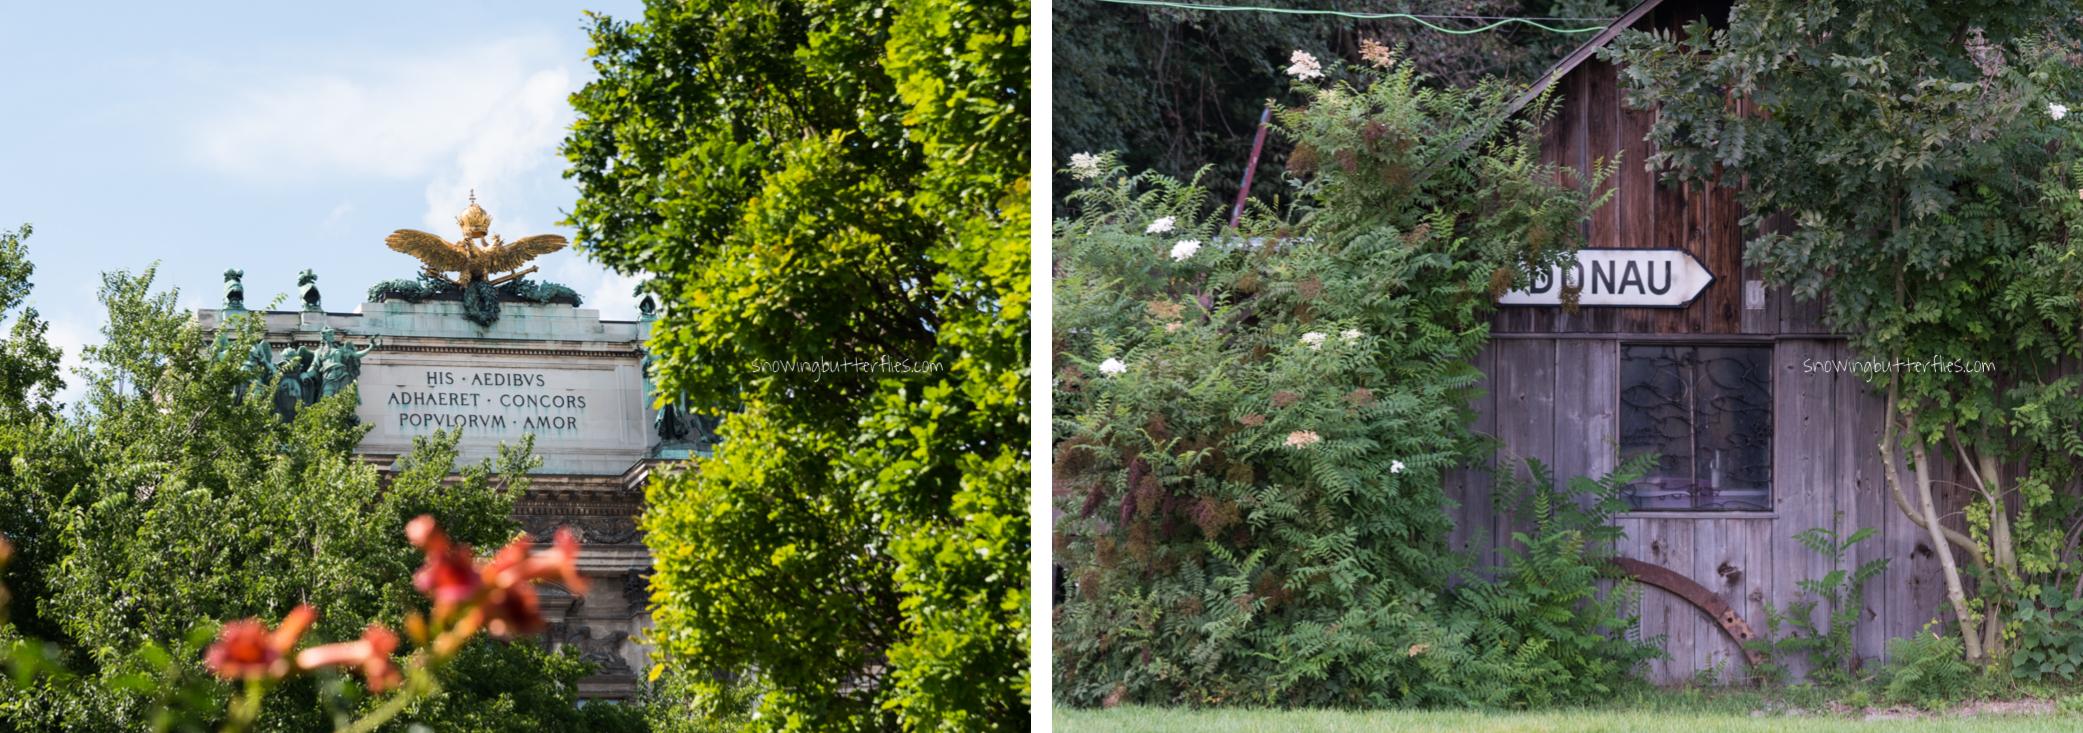 mariana perrone, austria, snowing butterflies, still life, landscape, seasons, donau